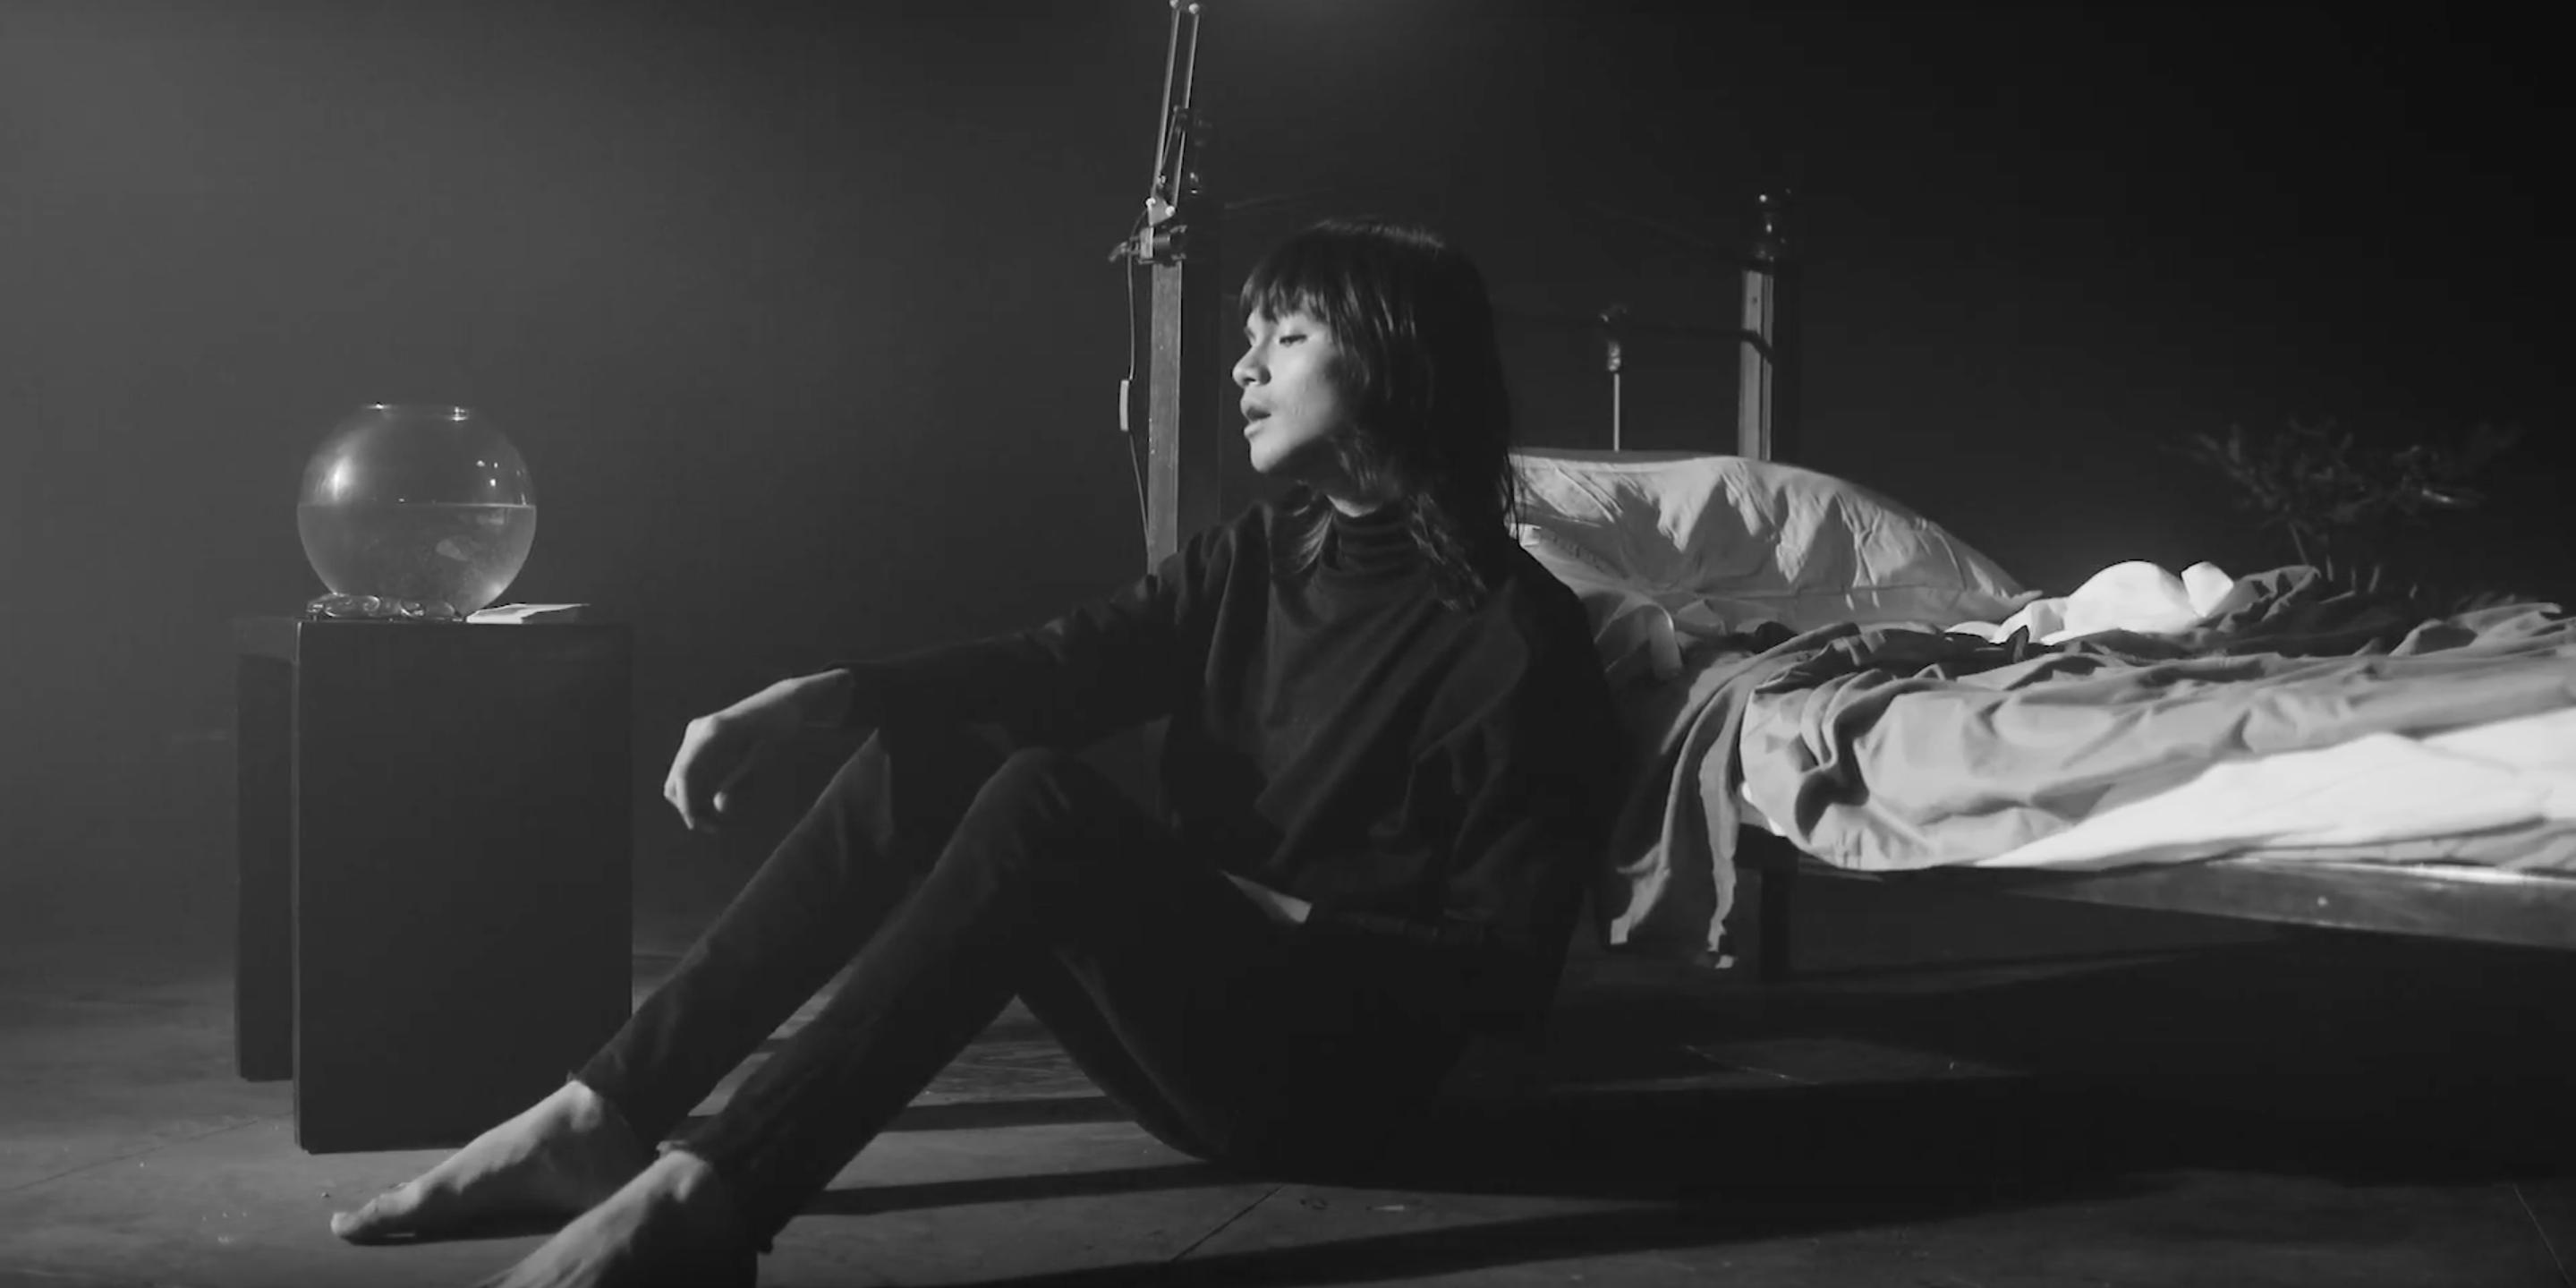 Unique debuts somber solo single 'Midnight Sky' – watch